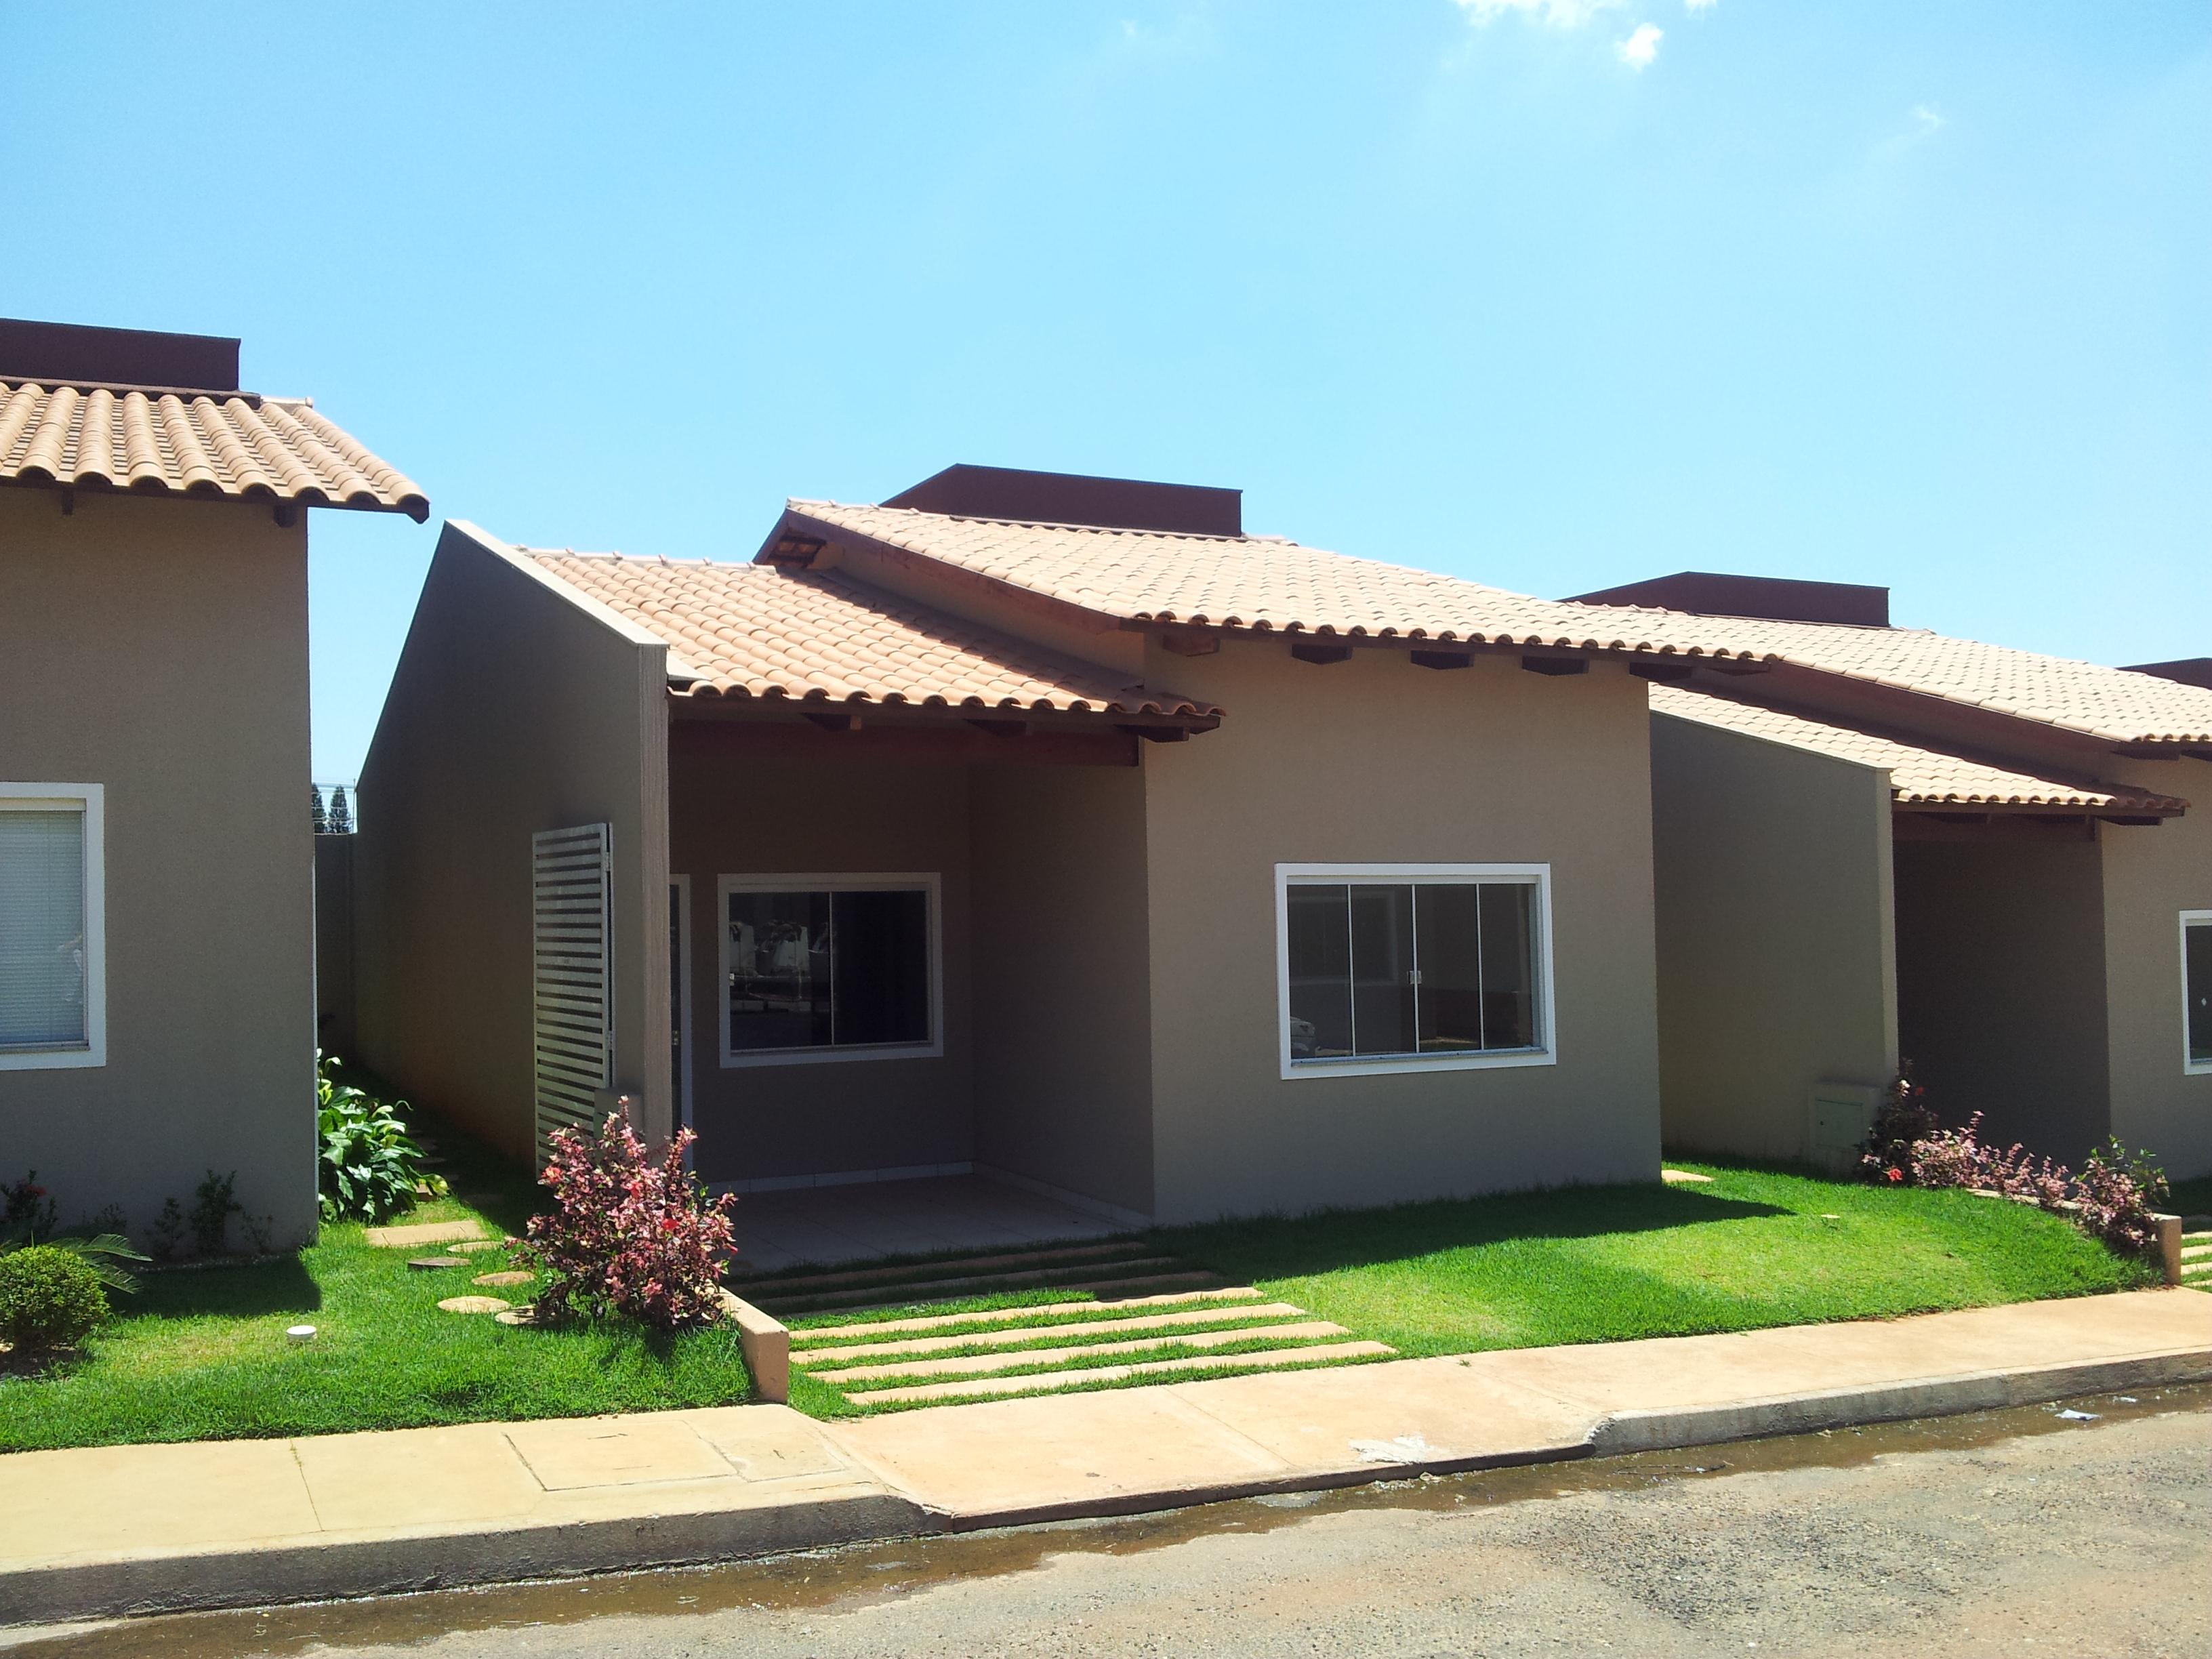 Pronto para morar Condominio horizontal Chácara Rural Compra / Venda  #028BC9 3264x2448